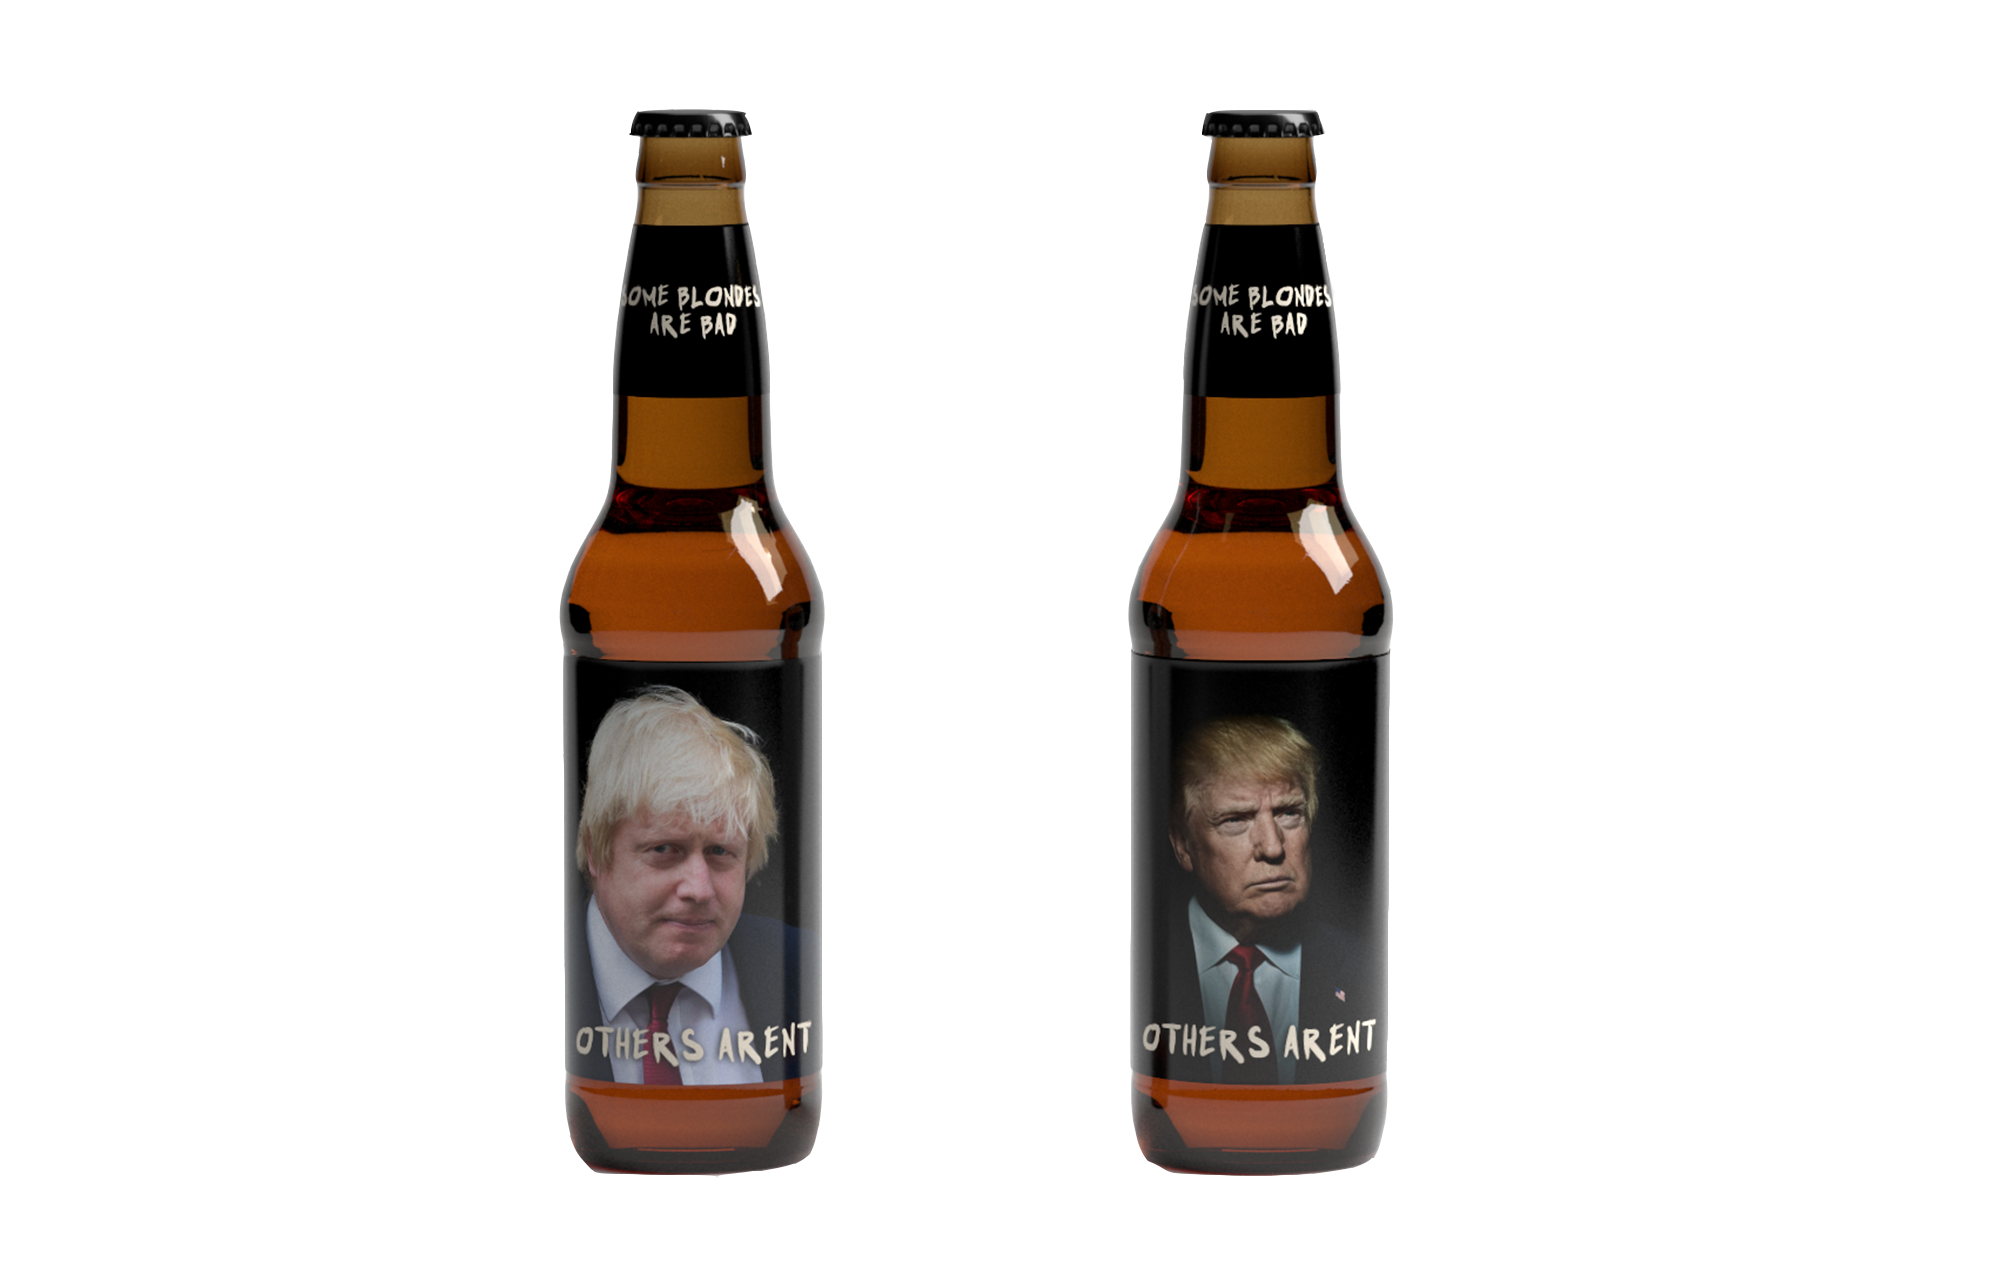 Blonde-bottles